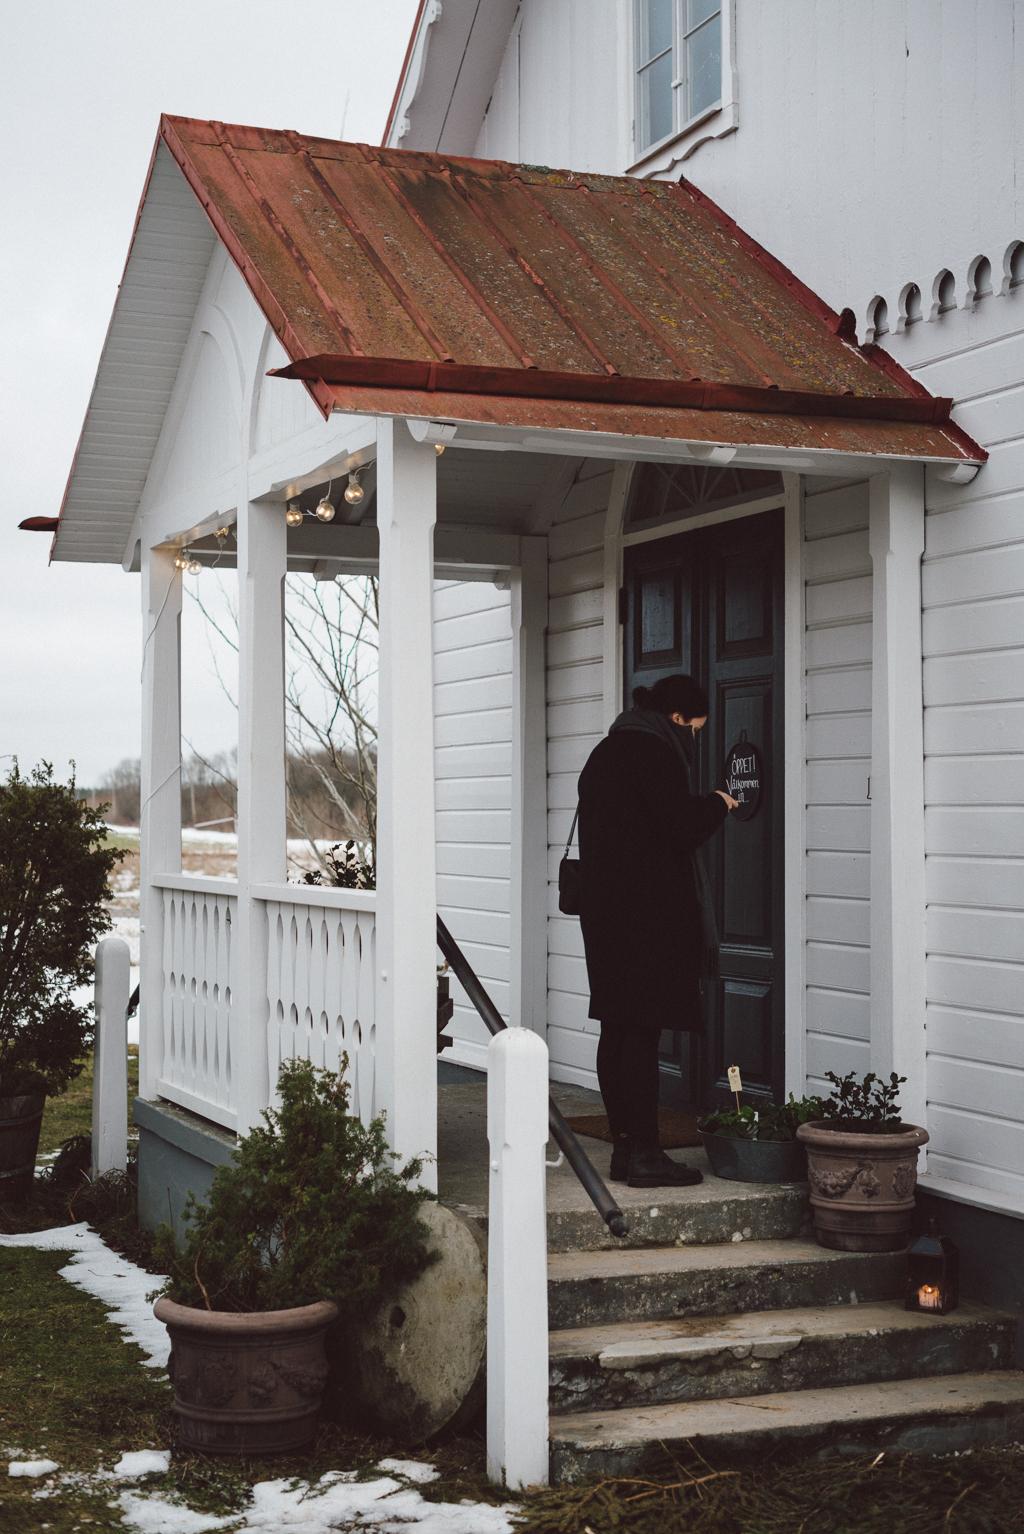 Babes_in_Boyland_Gotland_Foto_Matilda-Hildingsson_Stylist_Nathalie-Myrberg-28